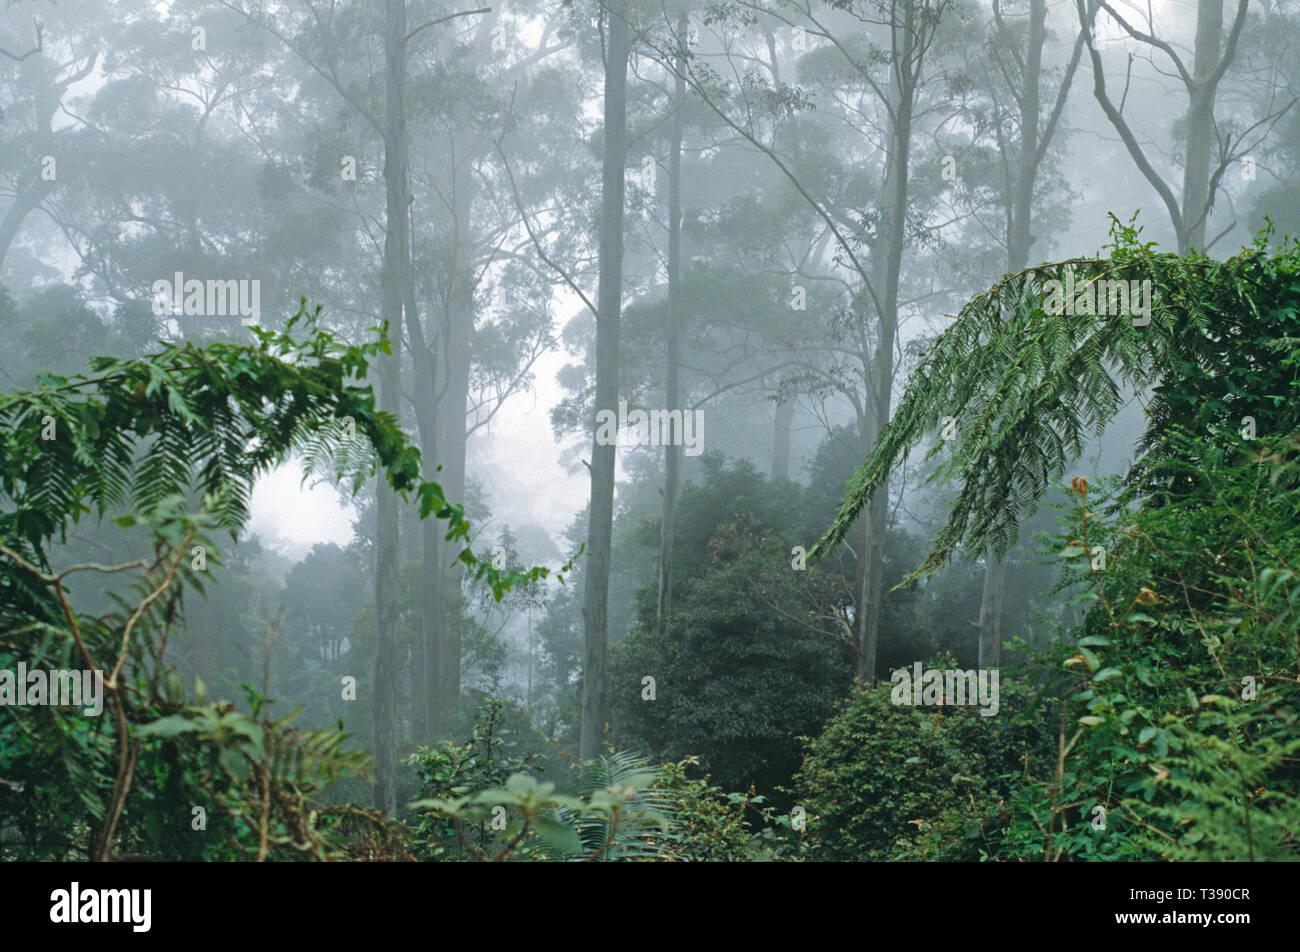 Australia.  Victoria. Misty forest. Yarra Ranges. Mountain Ash trees (Eucalyptus Regnans). - Stock Image